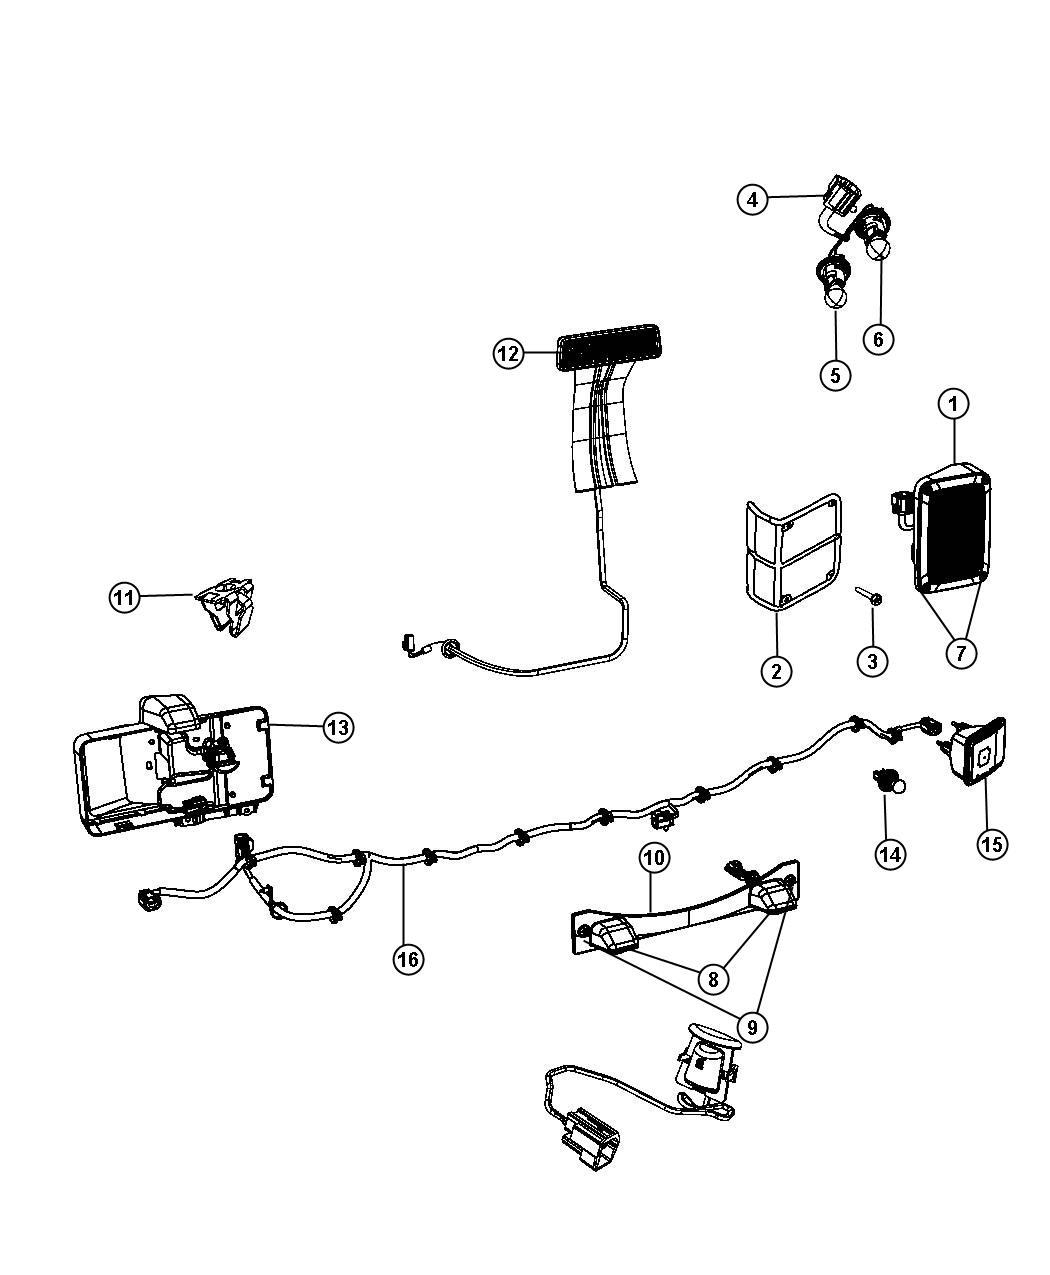 Jeep Wrangler Wiring. Rear bumper. Export. Black, module